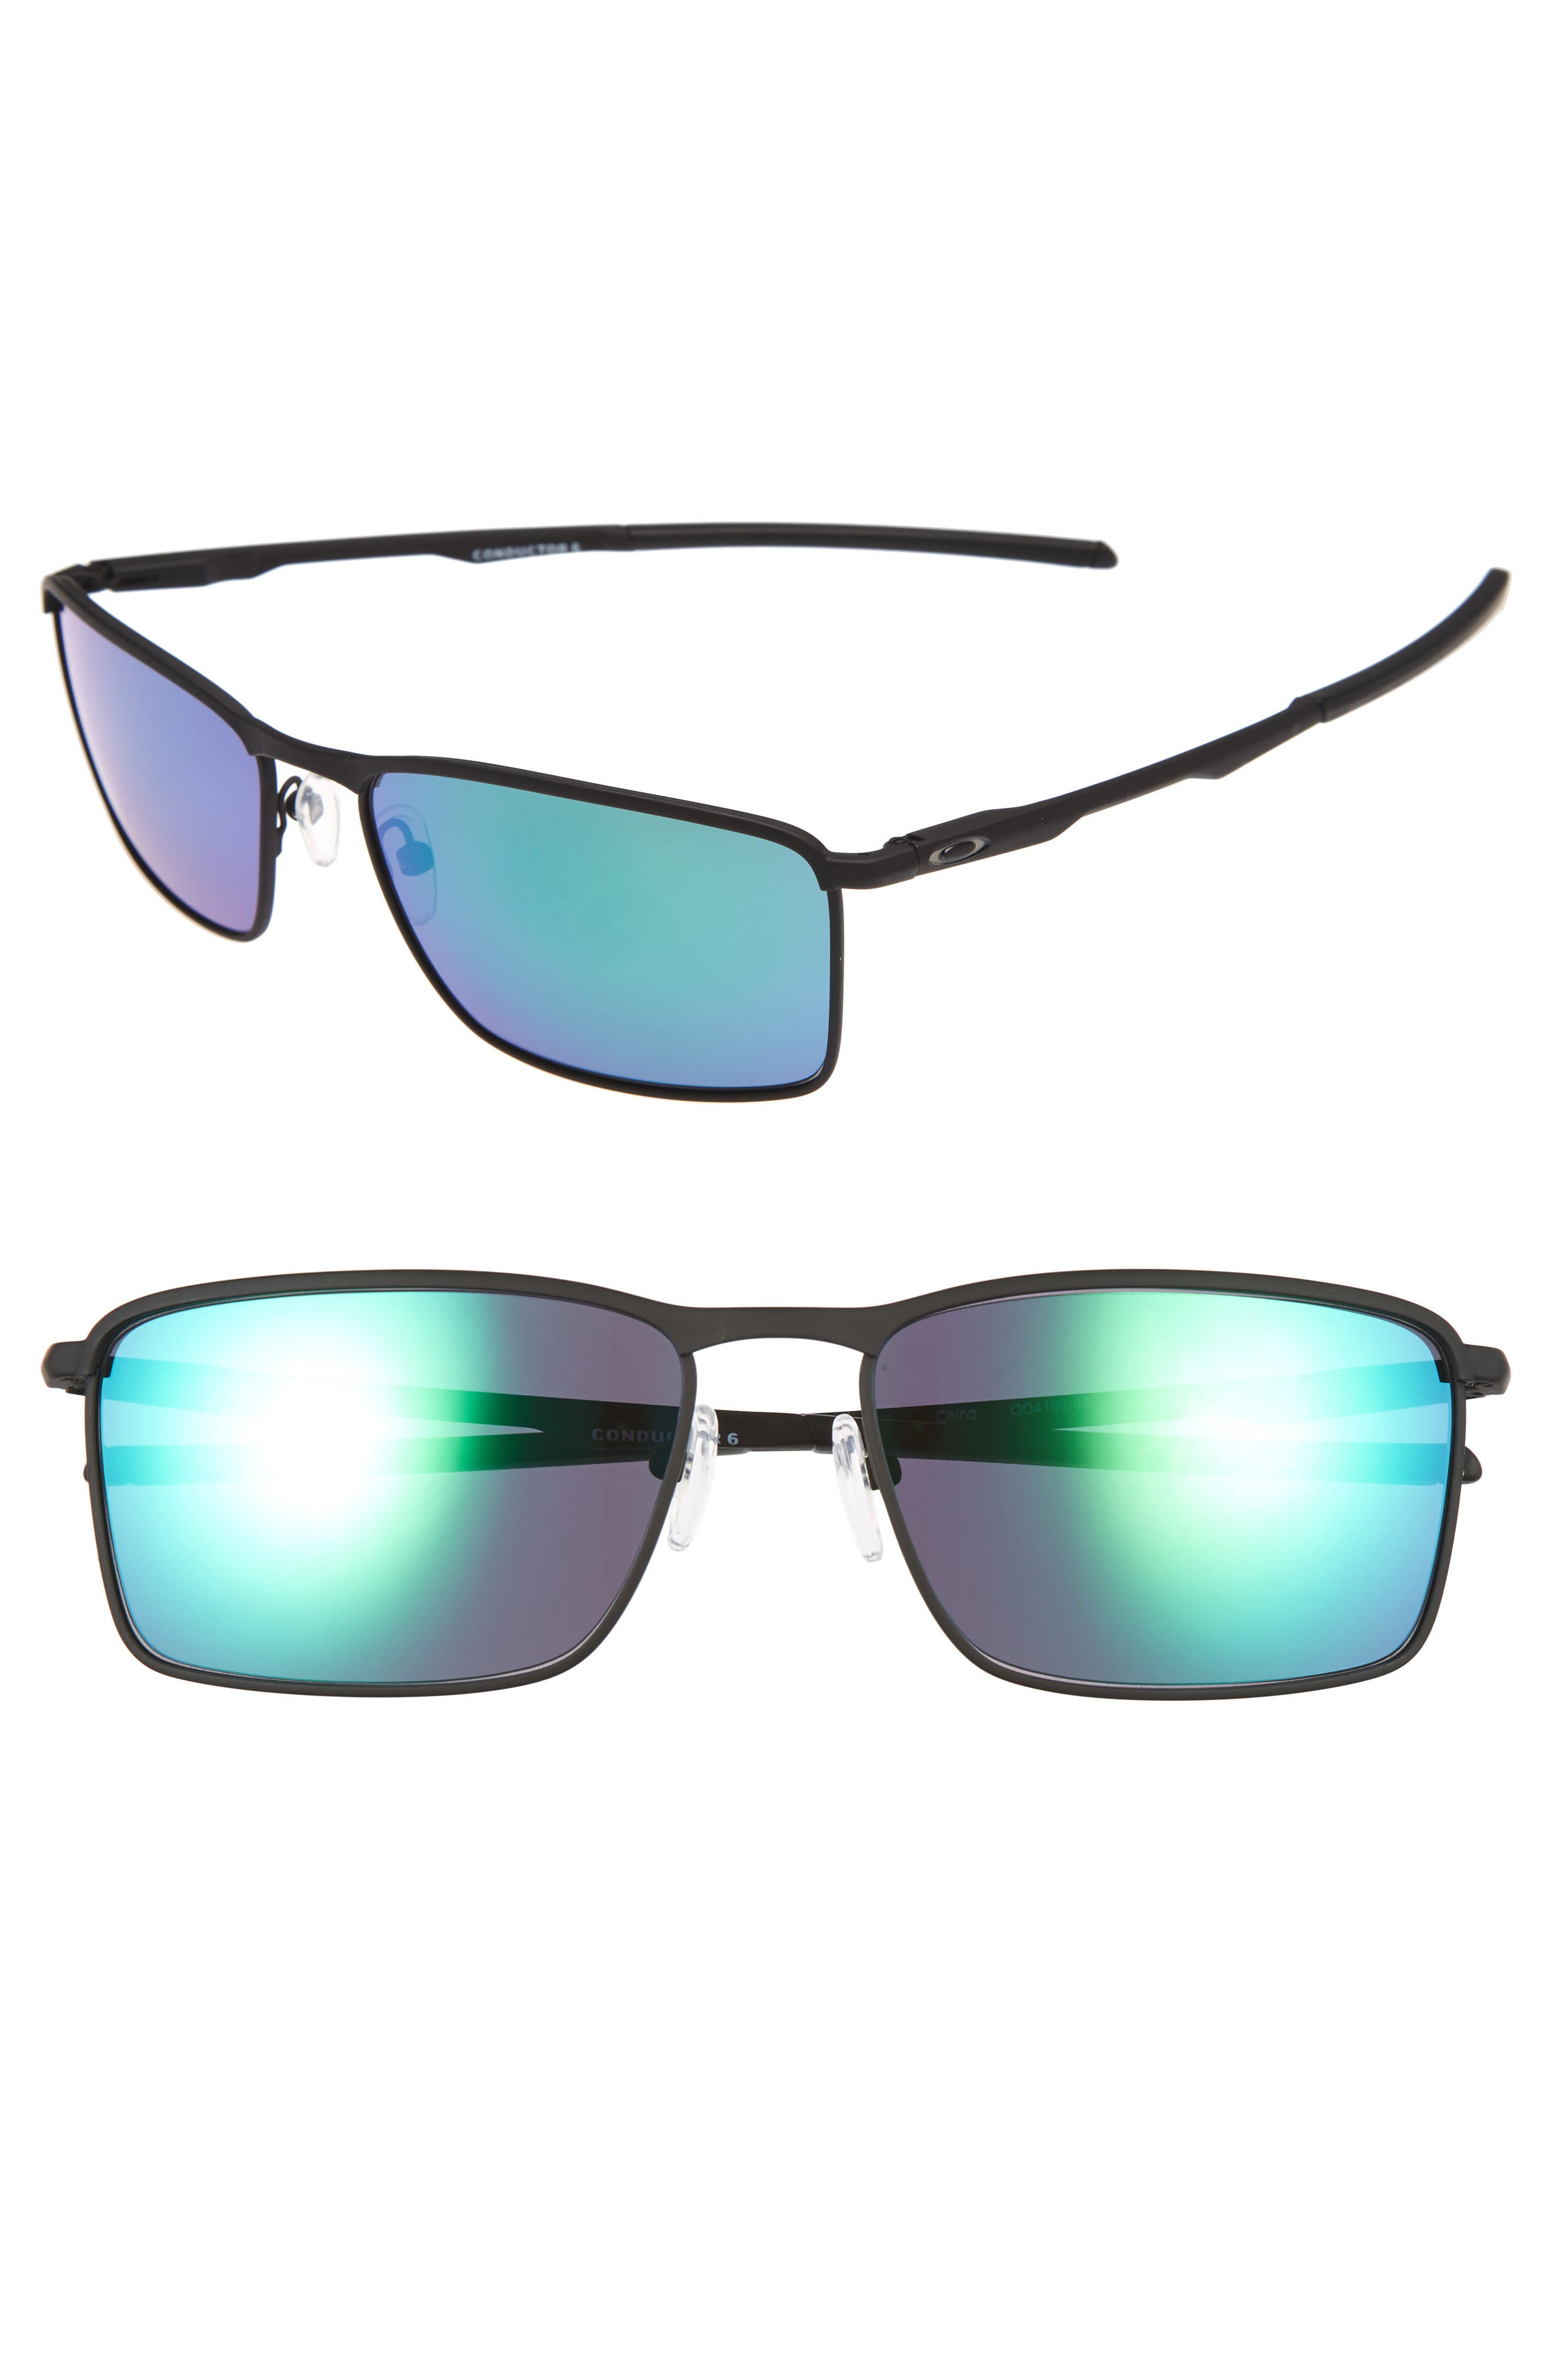 Conductor 6 58mm Polarized Sunglasses,                             Main thumbnail 1, color,                             001